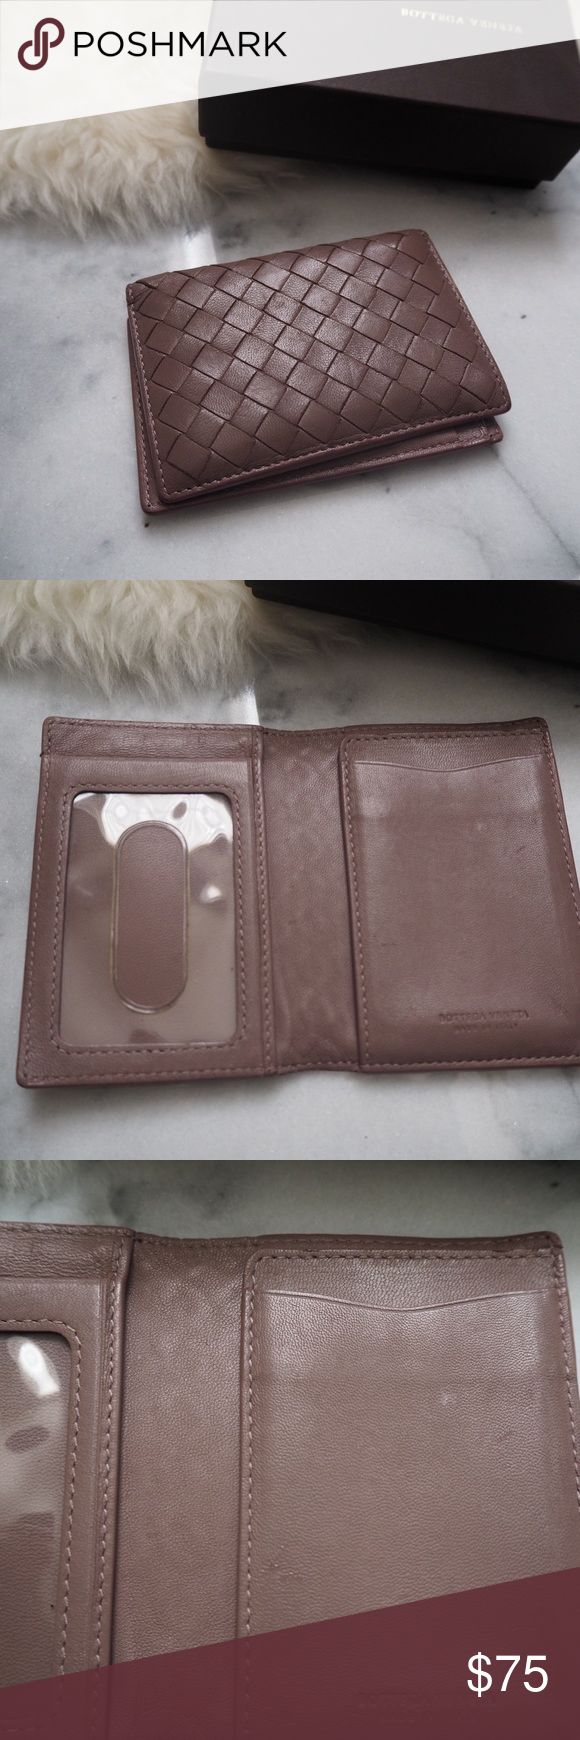 Bottega Veneta Purple Card Holder Bottega Veneta Card Holder • Condition is used (see pix for marks n cracks on the corners) • Comes with box Bottega Veneta Bags Wallets